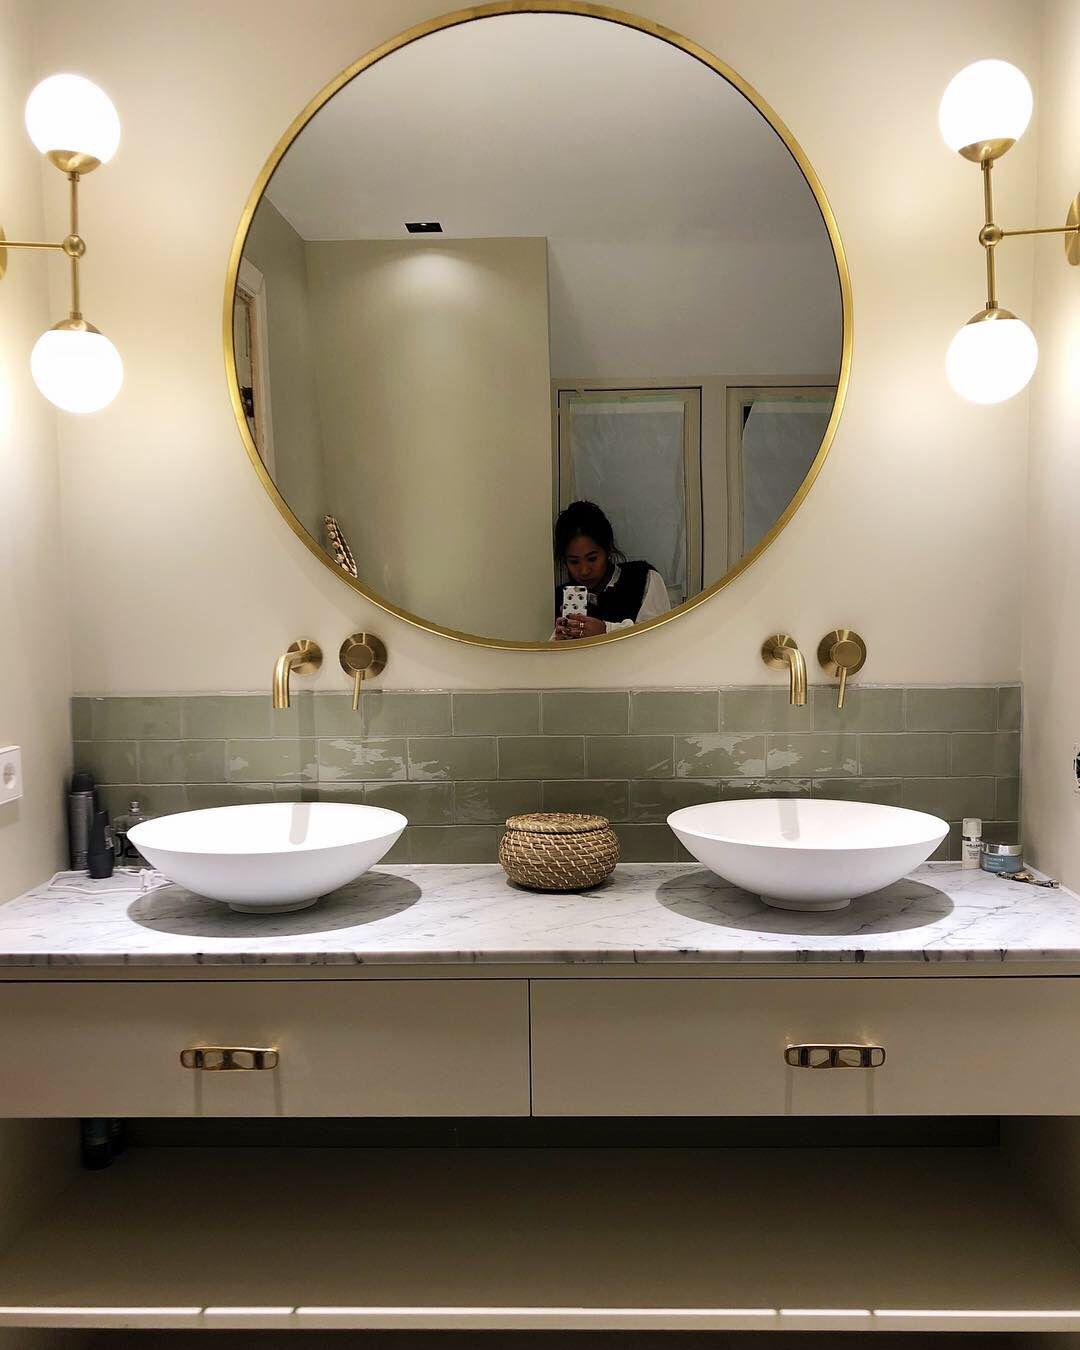 Our Bathroom Spiegel Badkamer Spiegel Wastafel Badkamer